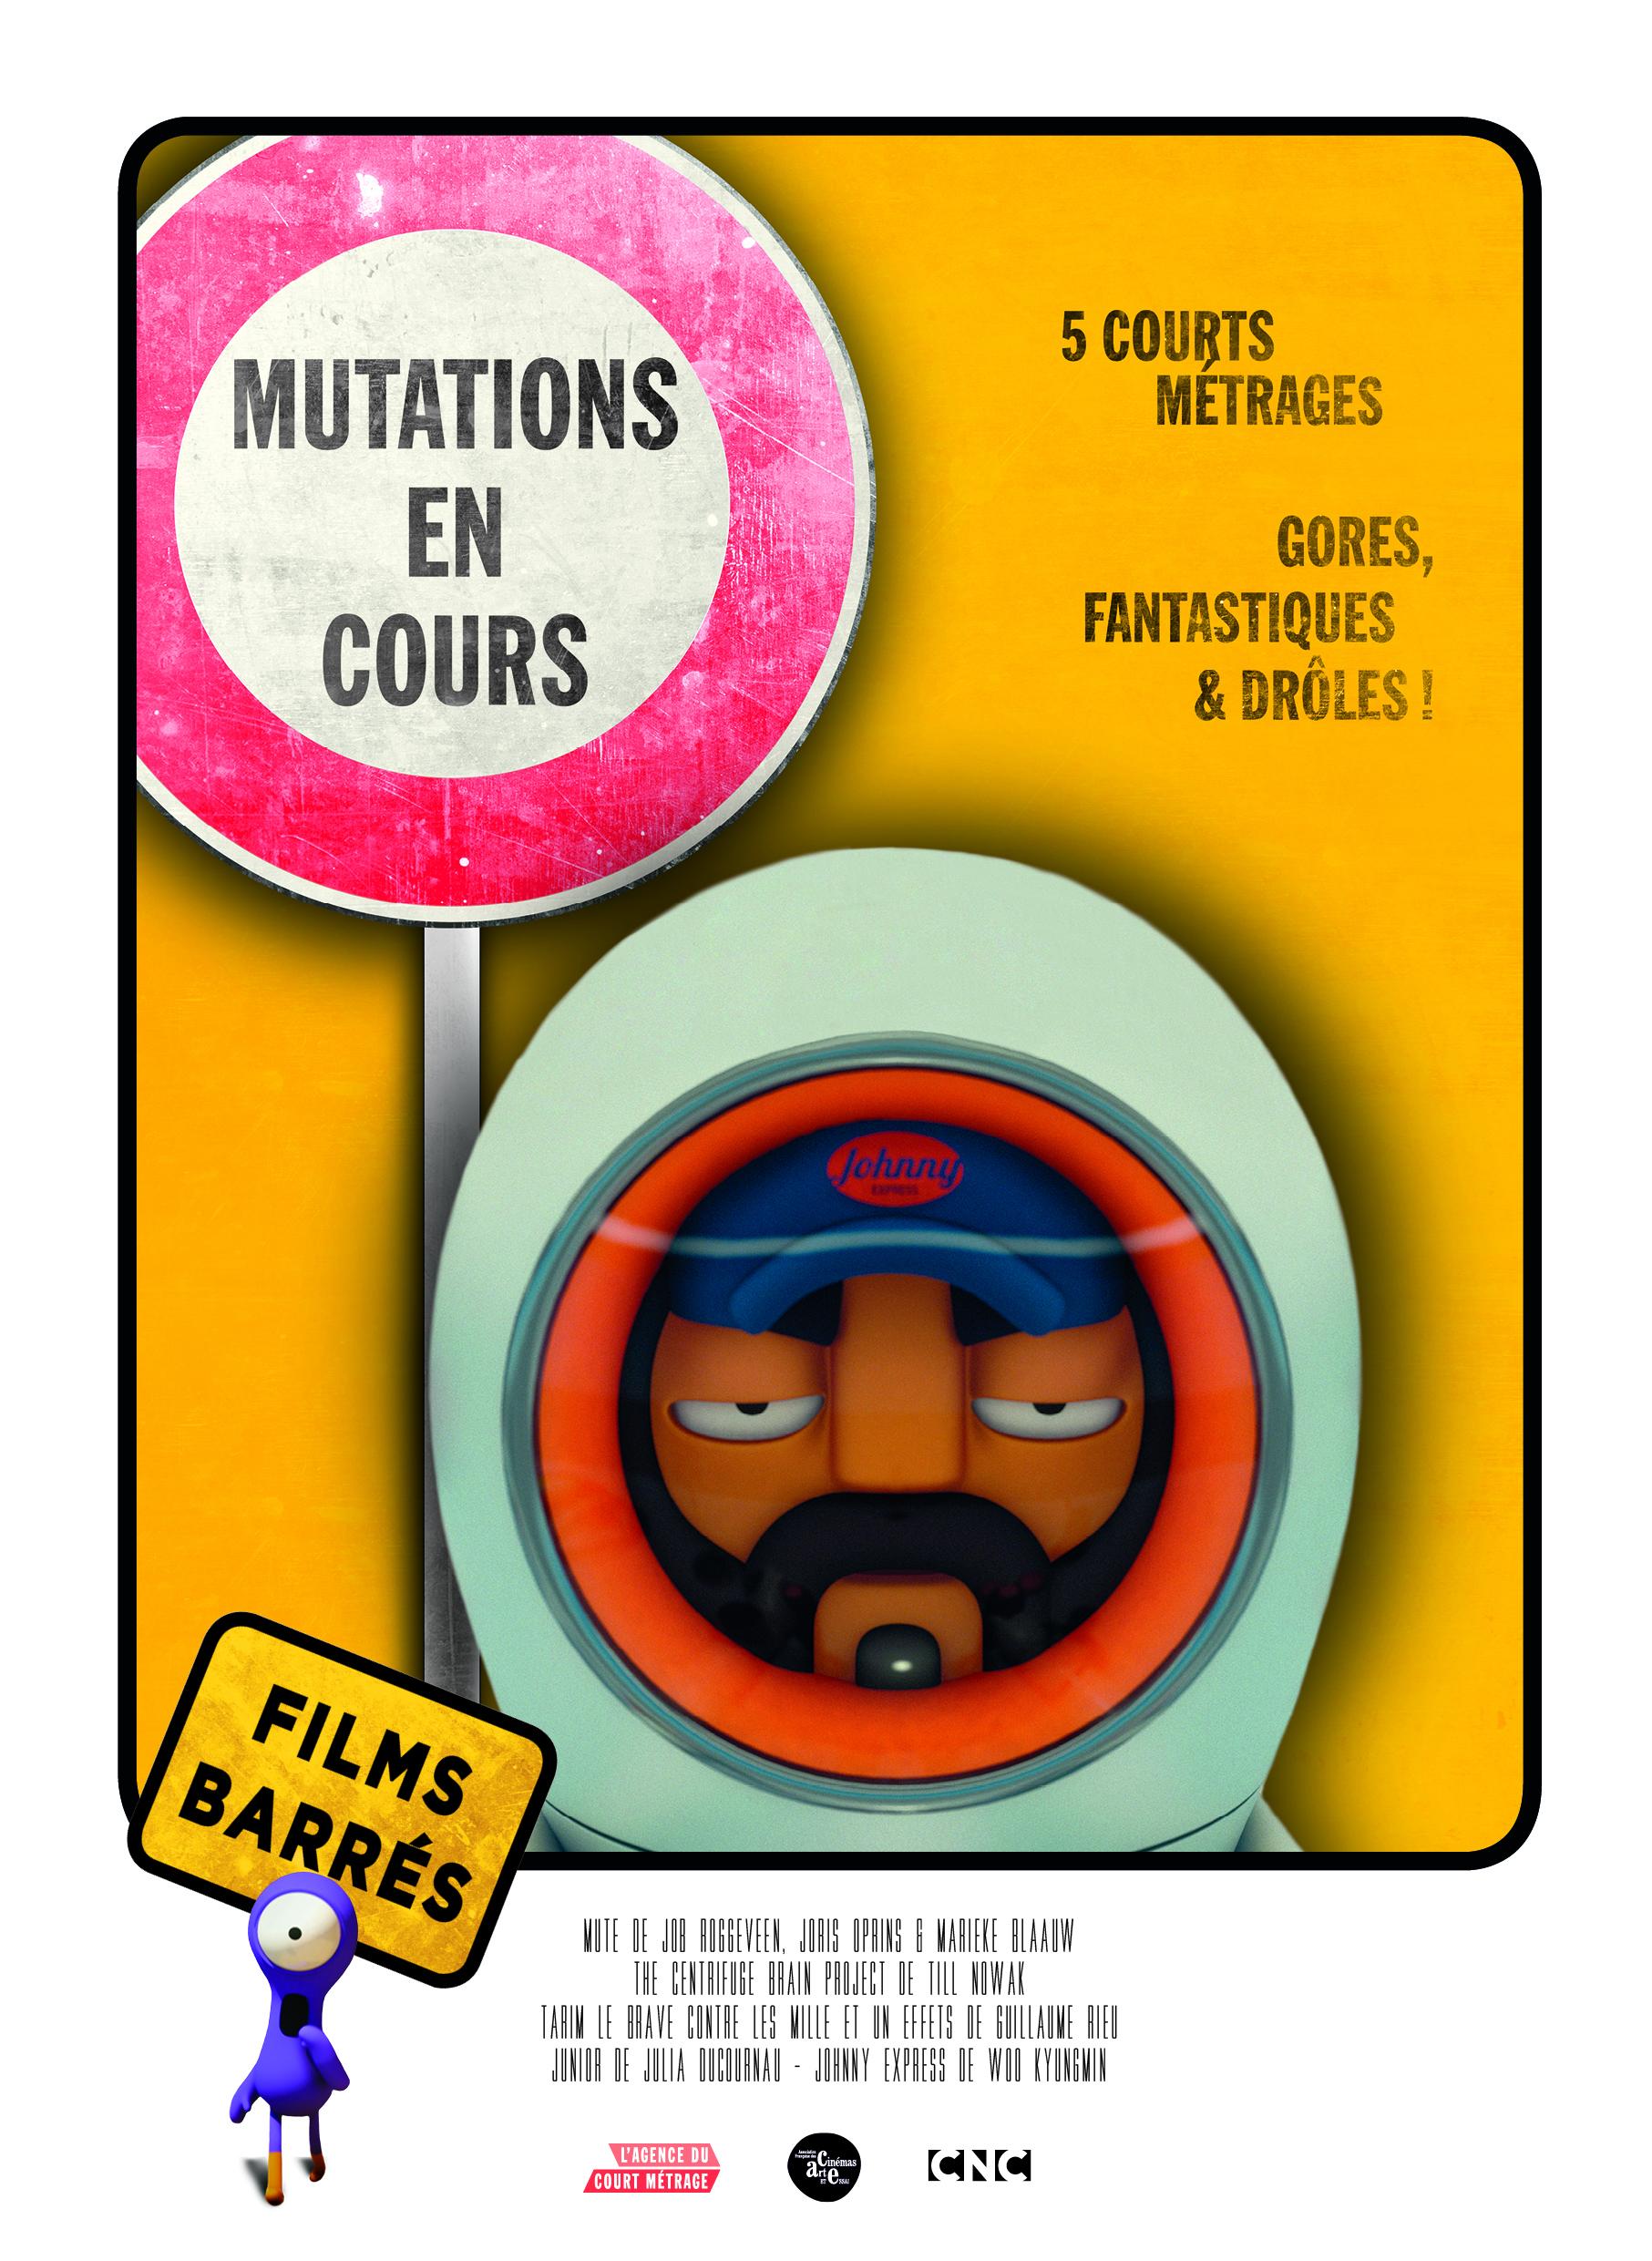 Mutations en cours